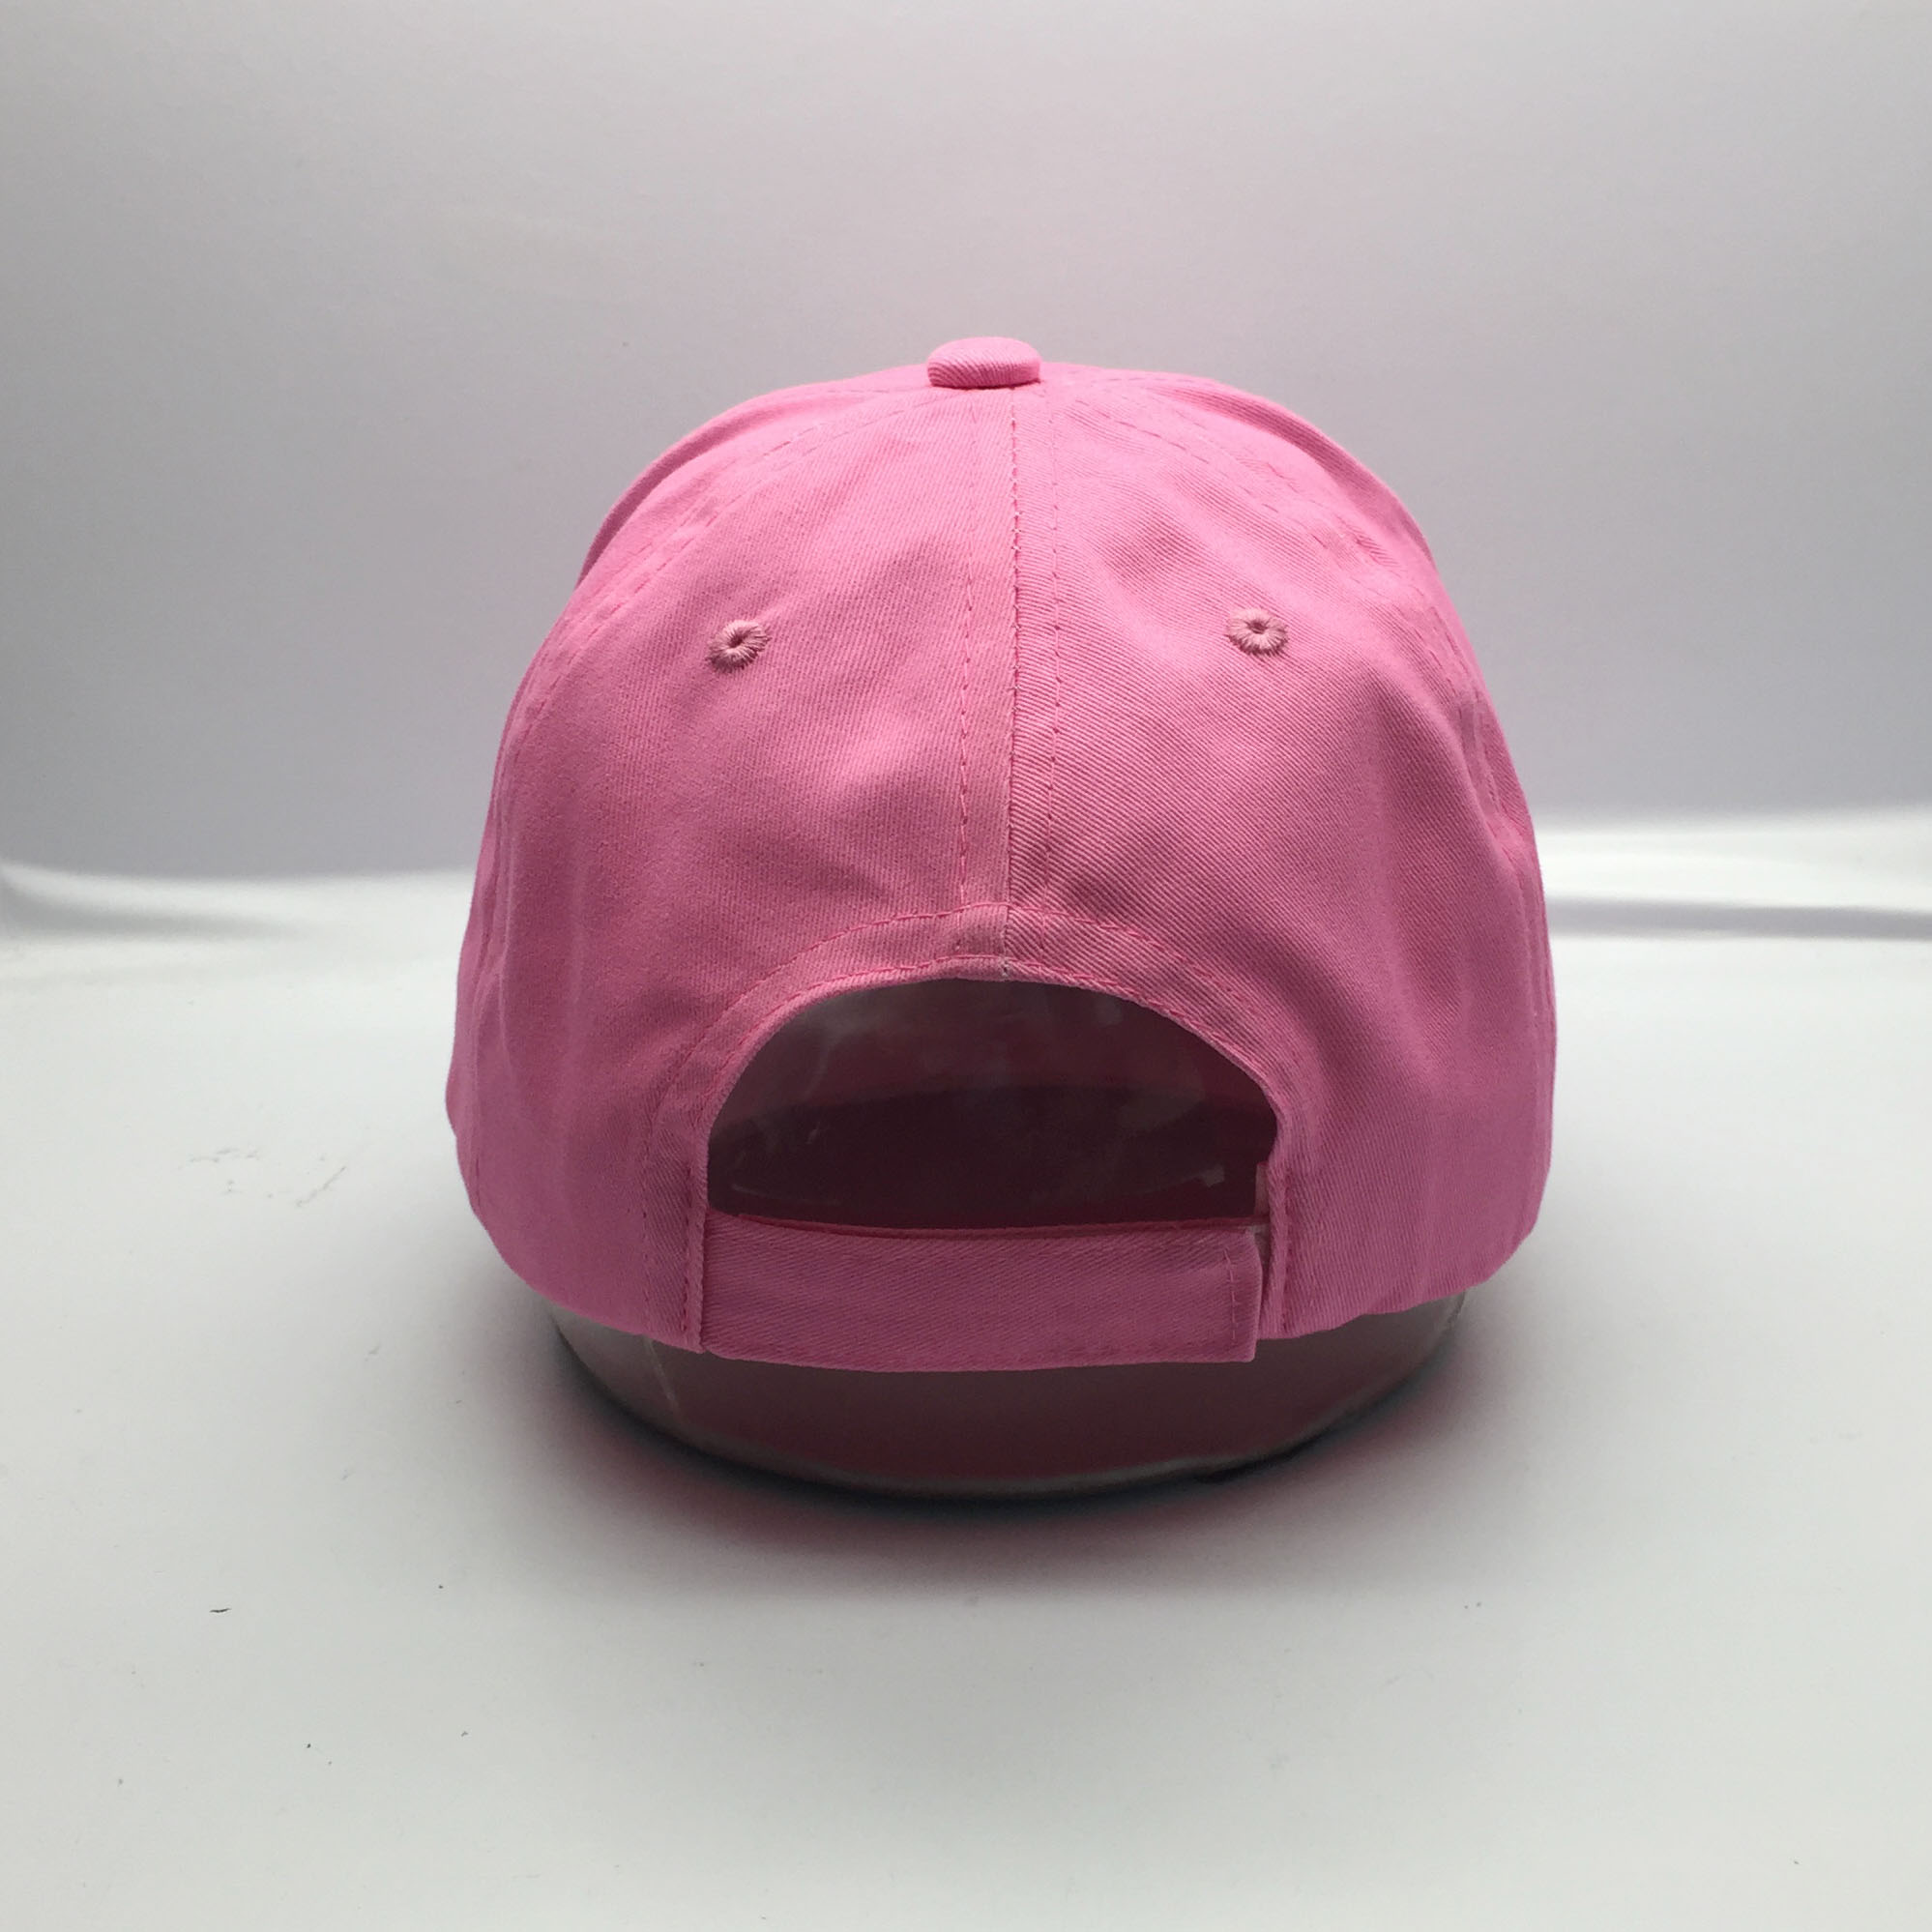 b562d328df3c62 Customize Silver Embroidery Hats Shiny Color Baseball Cap Face Cap ...